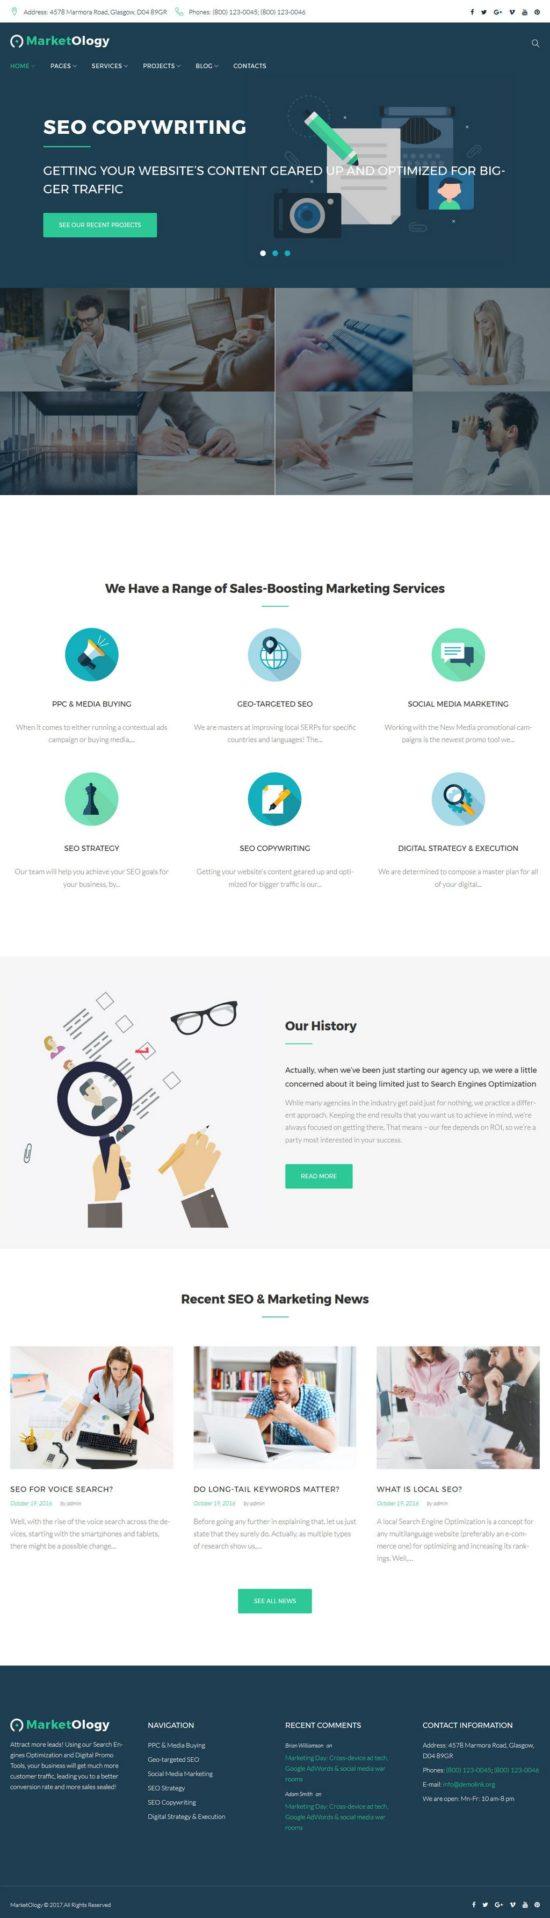 marketology templatemonster–wordpress theme 01 550x1918 - MarketOlogy WordPress Theme